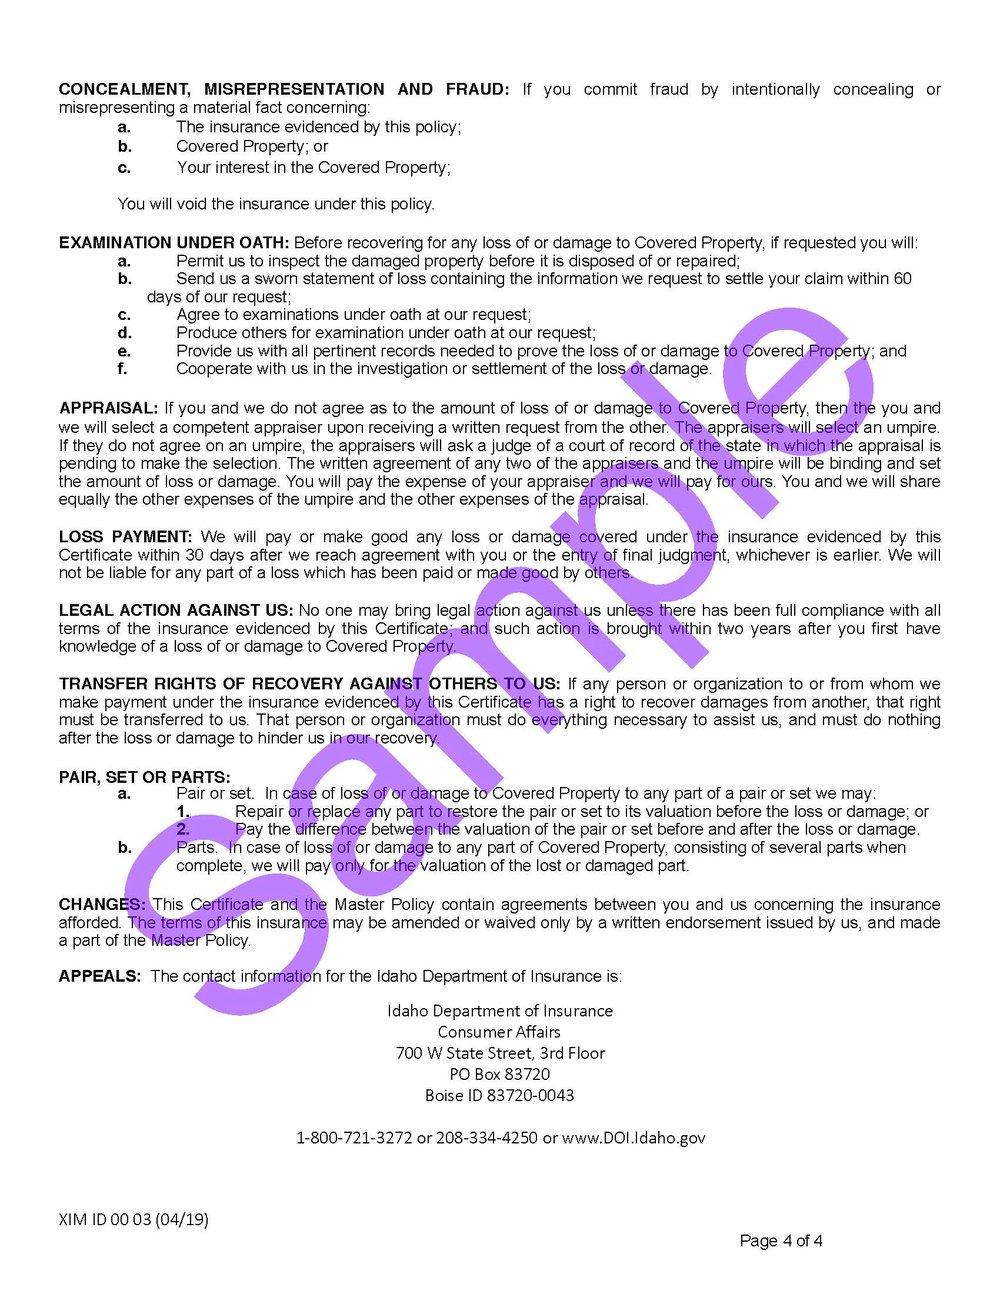 XIM ID 00 03 04 19 Idaho Certificate of InsuranceSample_Page_4.jpg